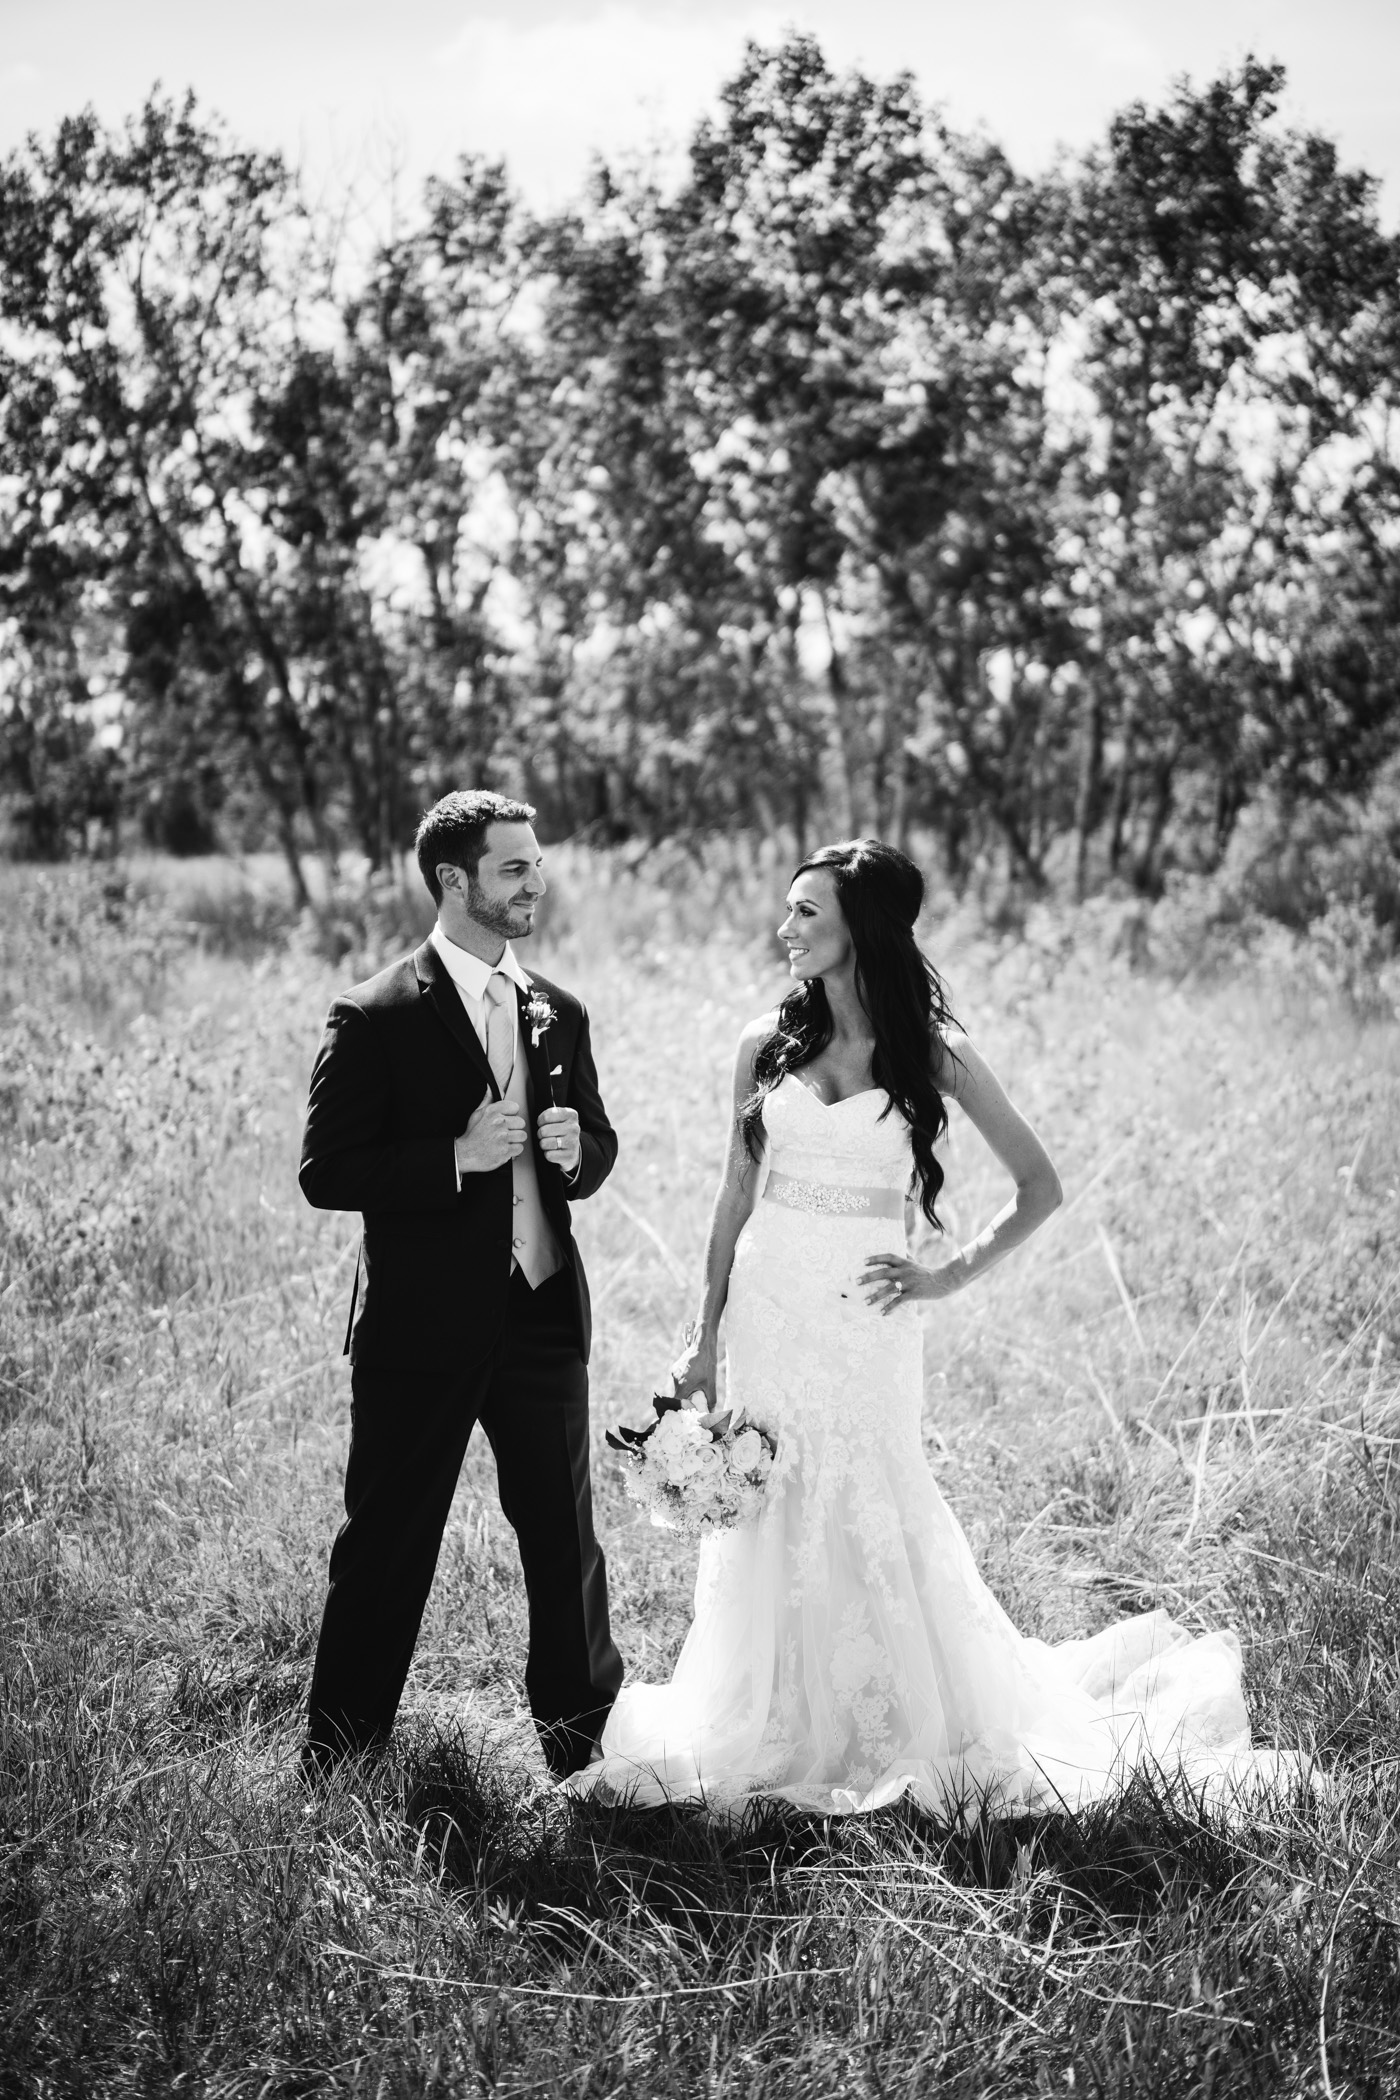 Hillary and Mark - Pineridge Hollow Wedding - Cojo Photo-1153.jpg